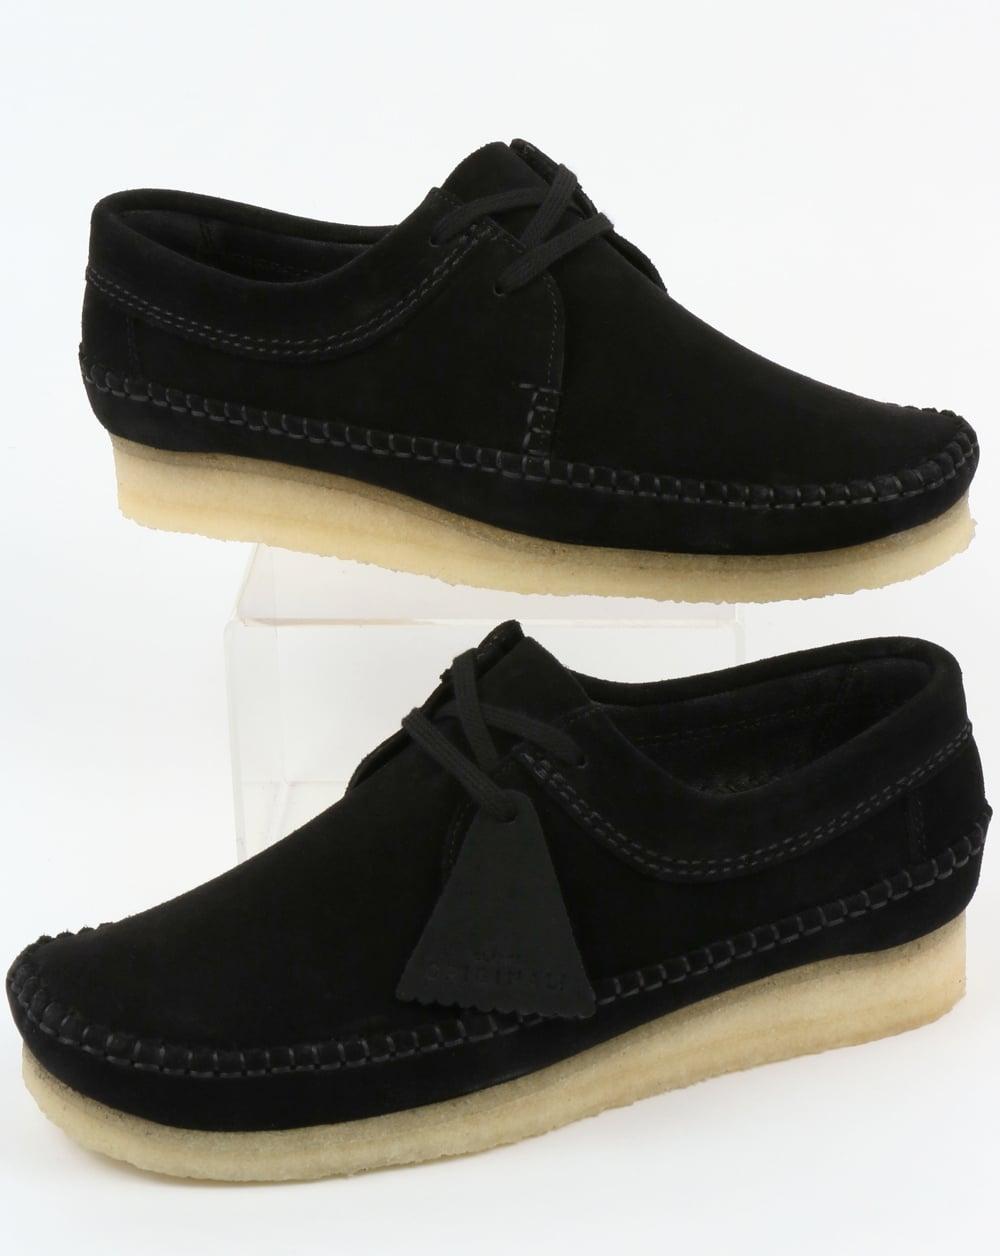 diversified latest designs amazing selection beautiful design Clarks Originals Weaver Suede Shoes Black